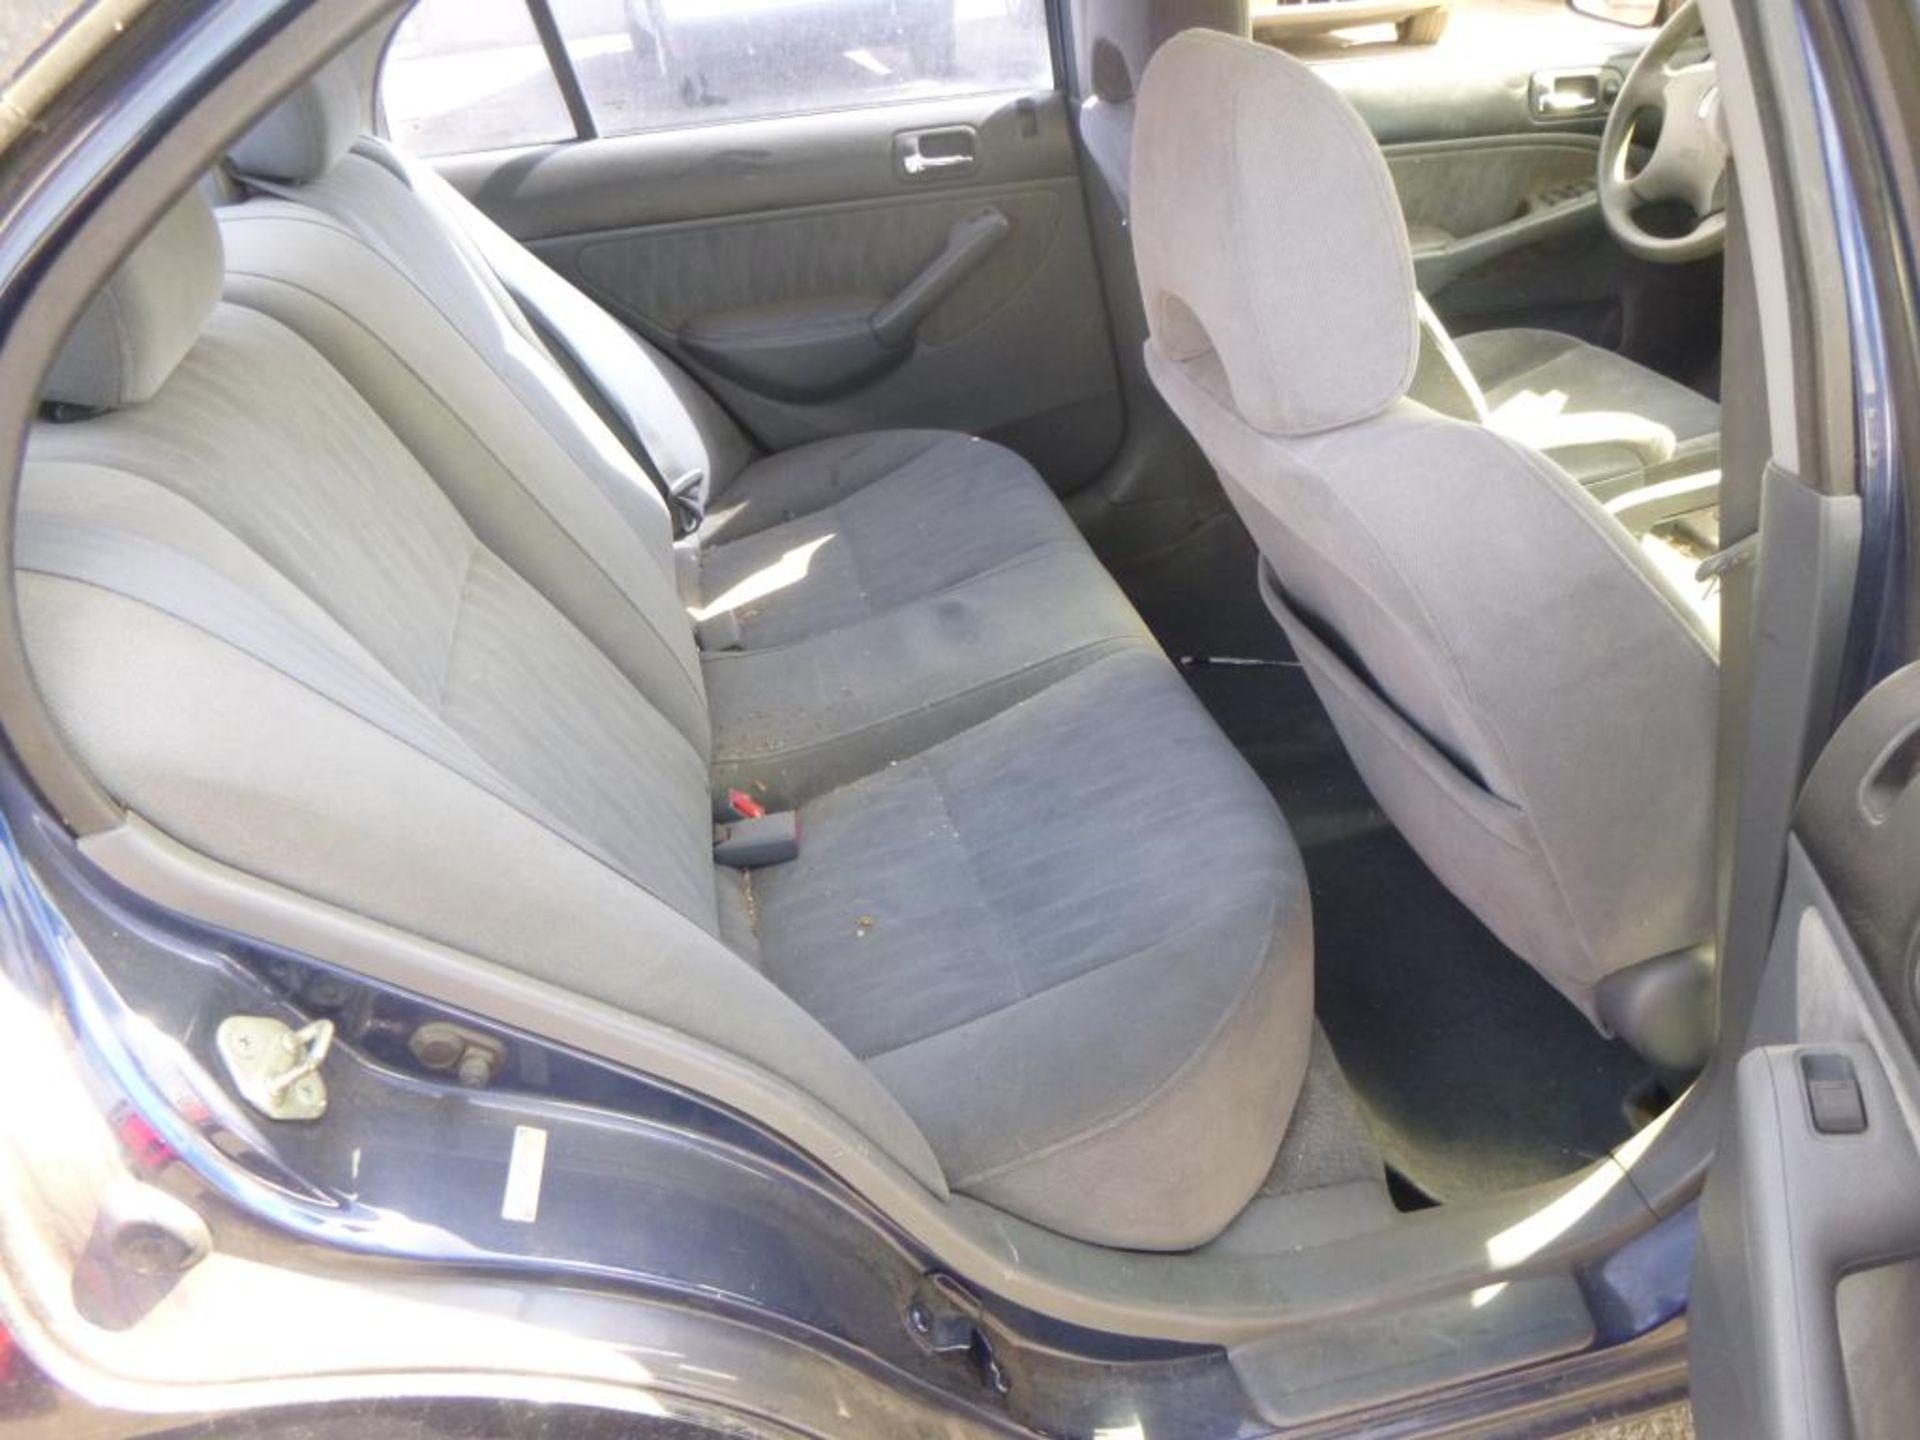 2004 Honda Civic - Image 8 of 14